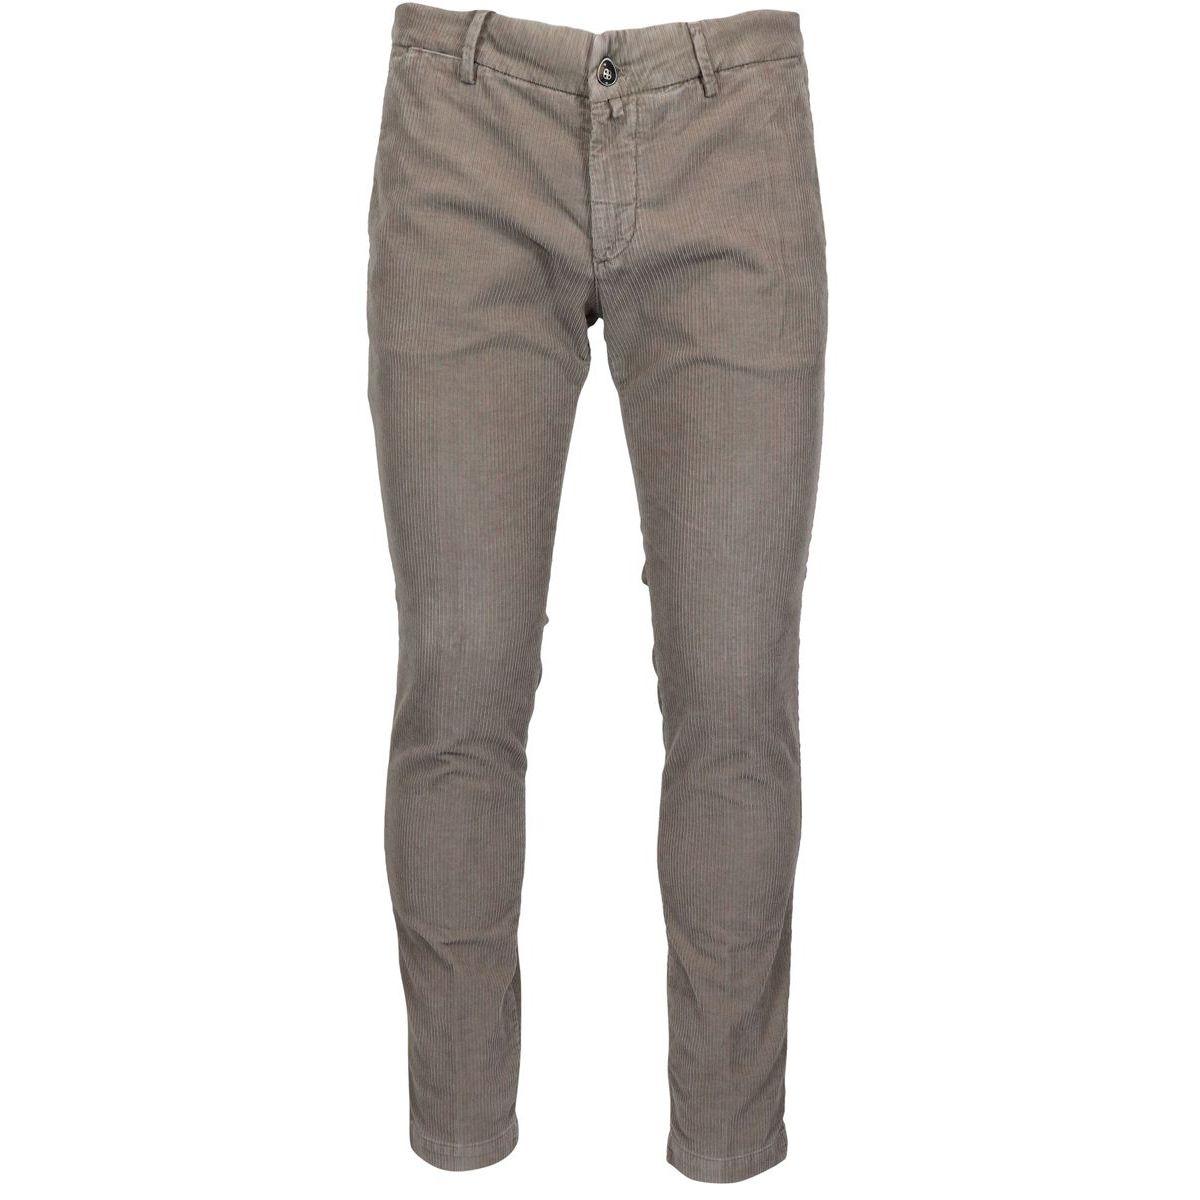 America pocket slim corduroy trousers Tortora Briglia